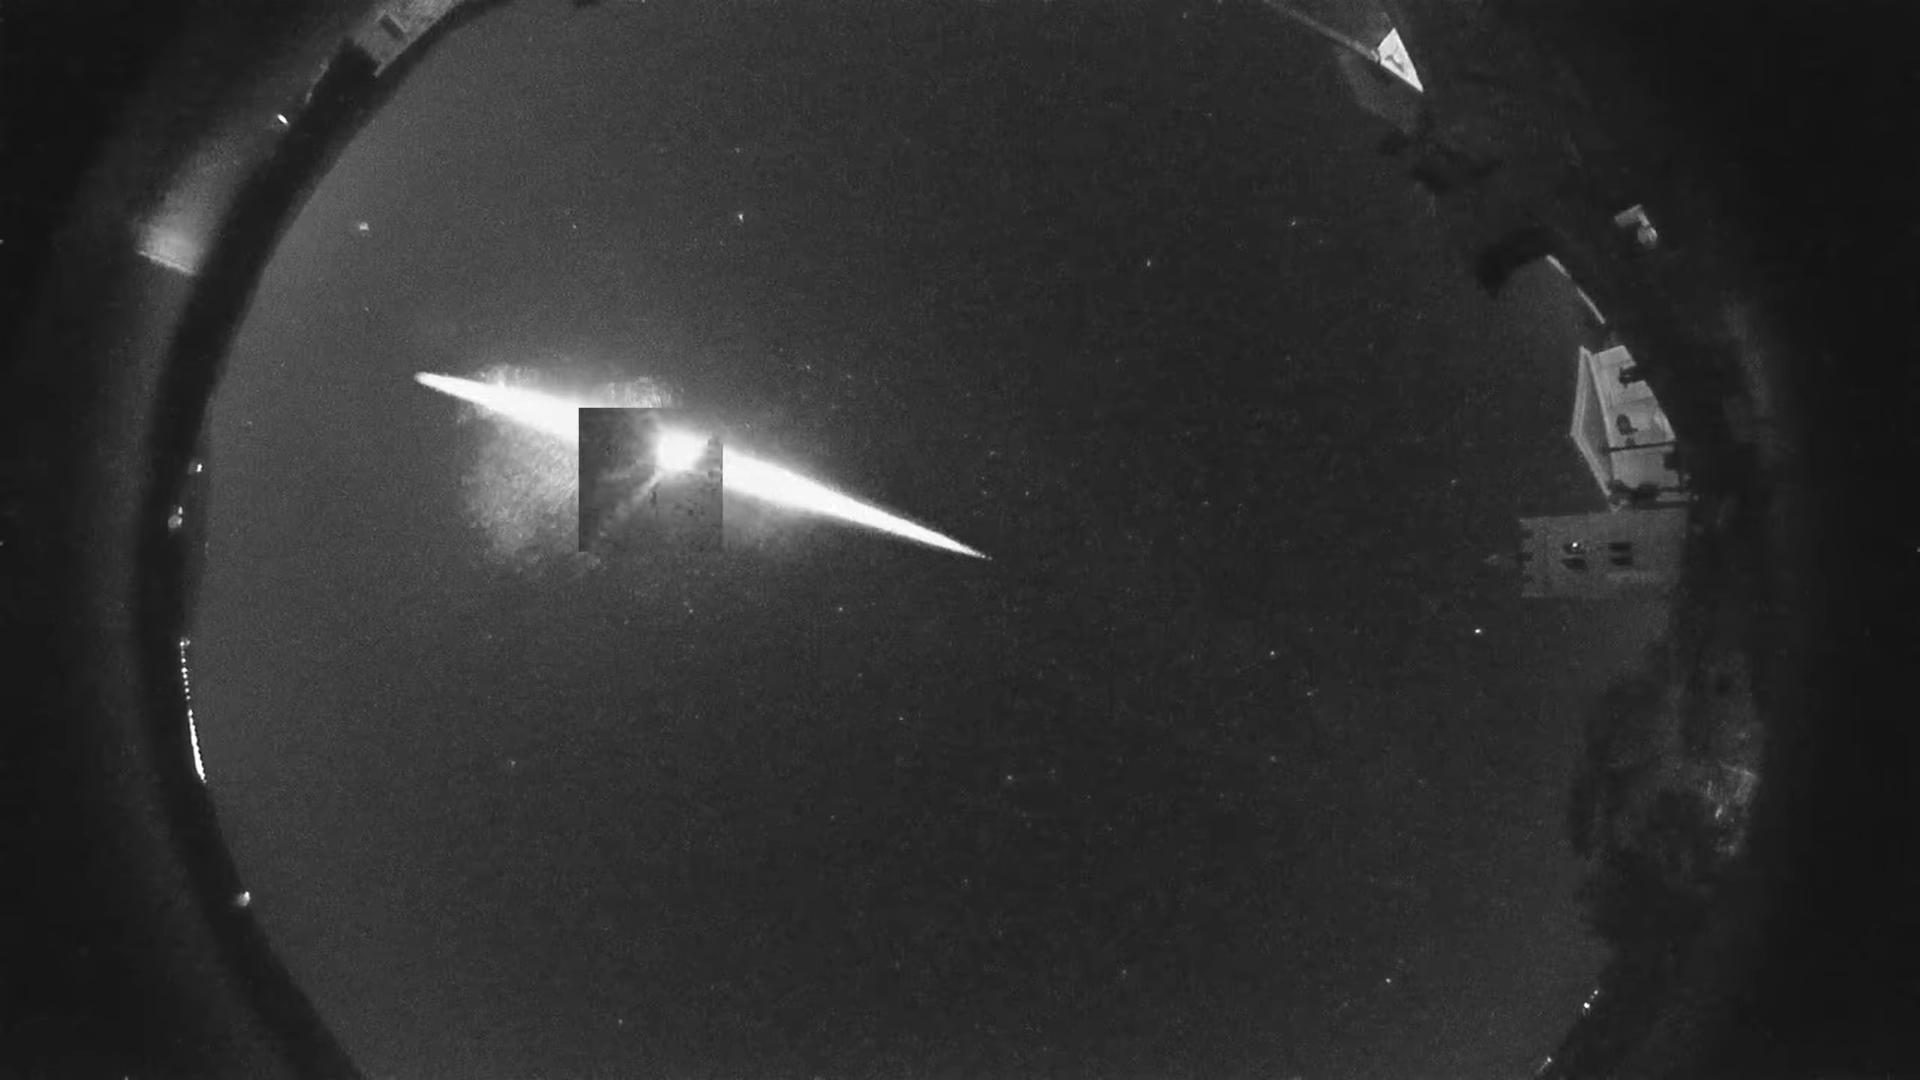 meteor_horvatorszag_21aug.jpg